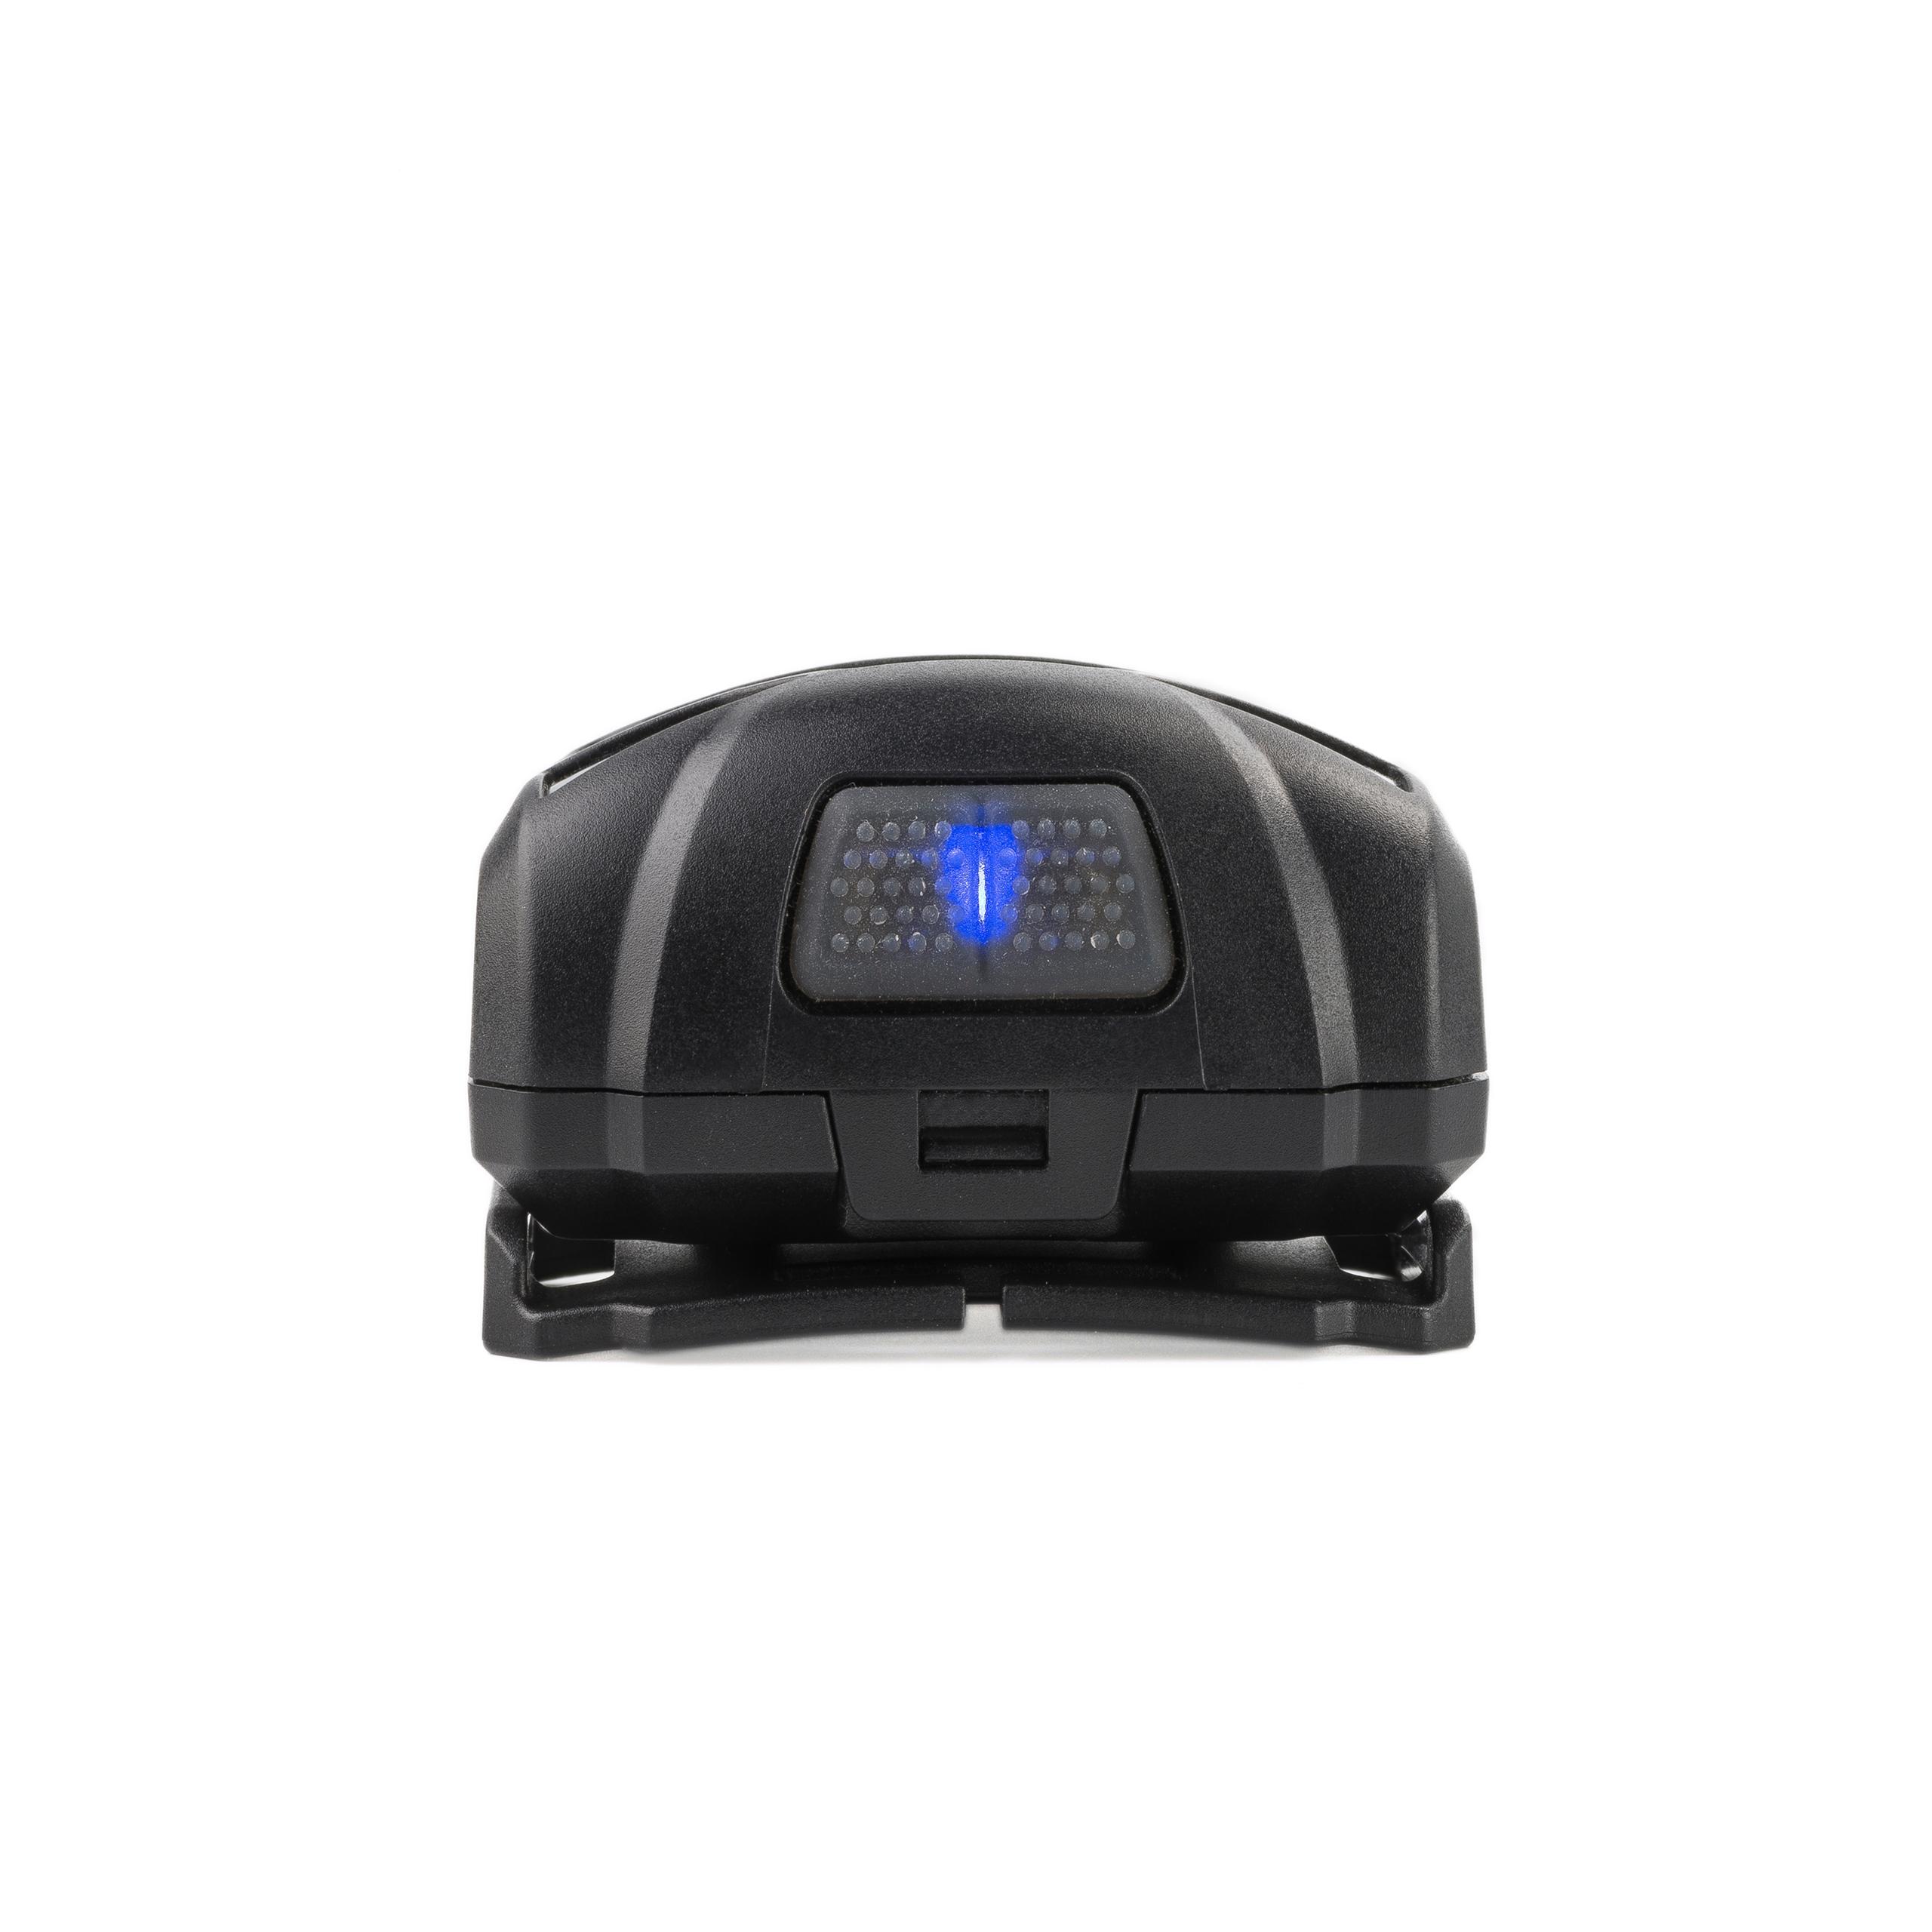 Sensor & Light control